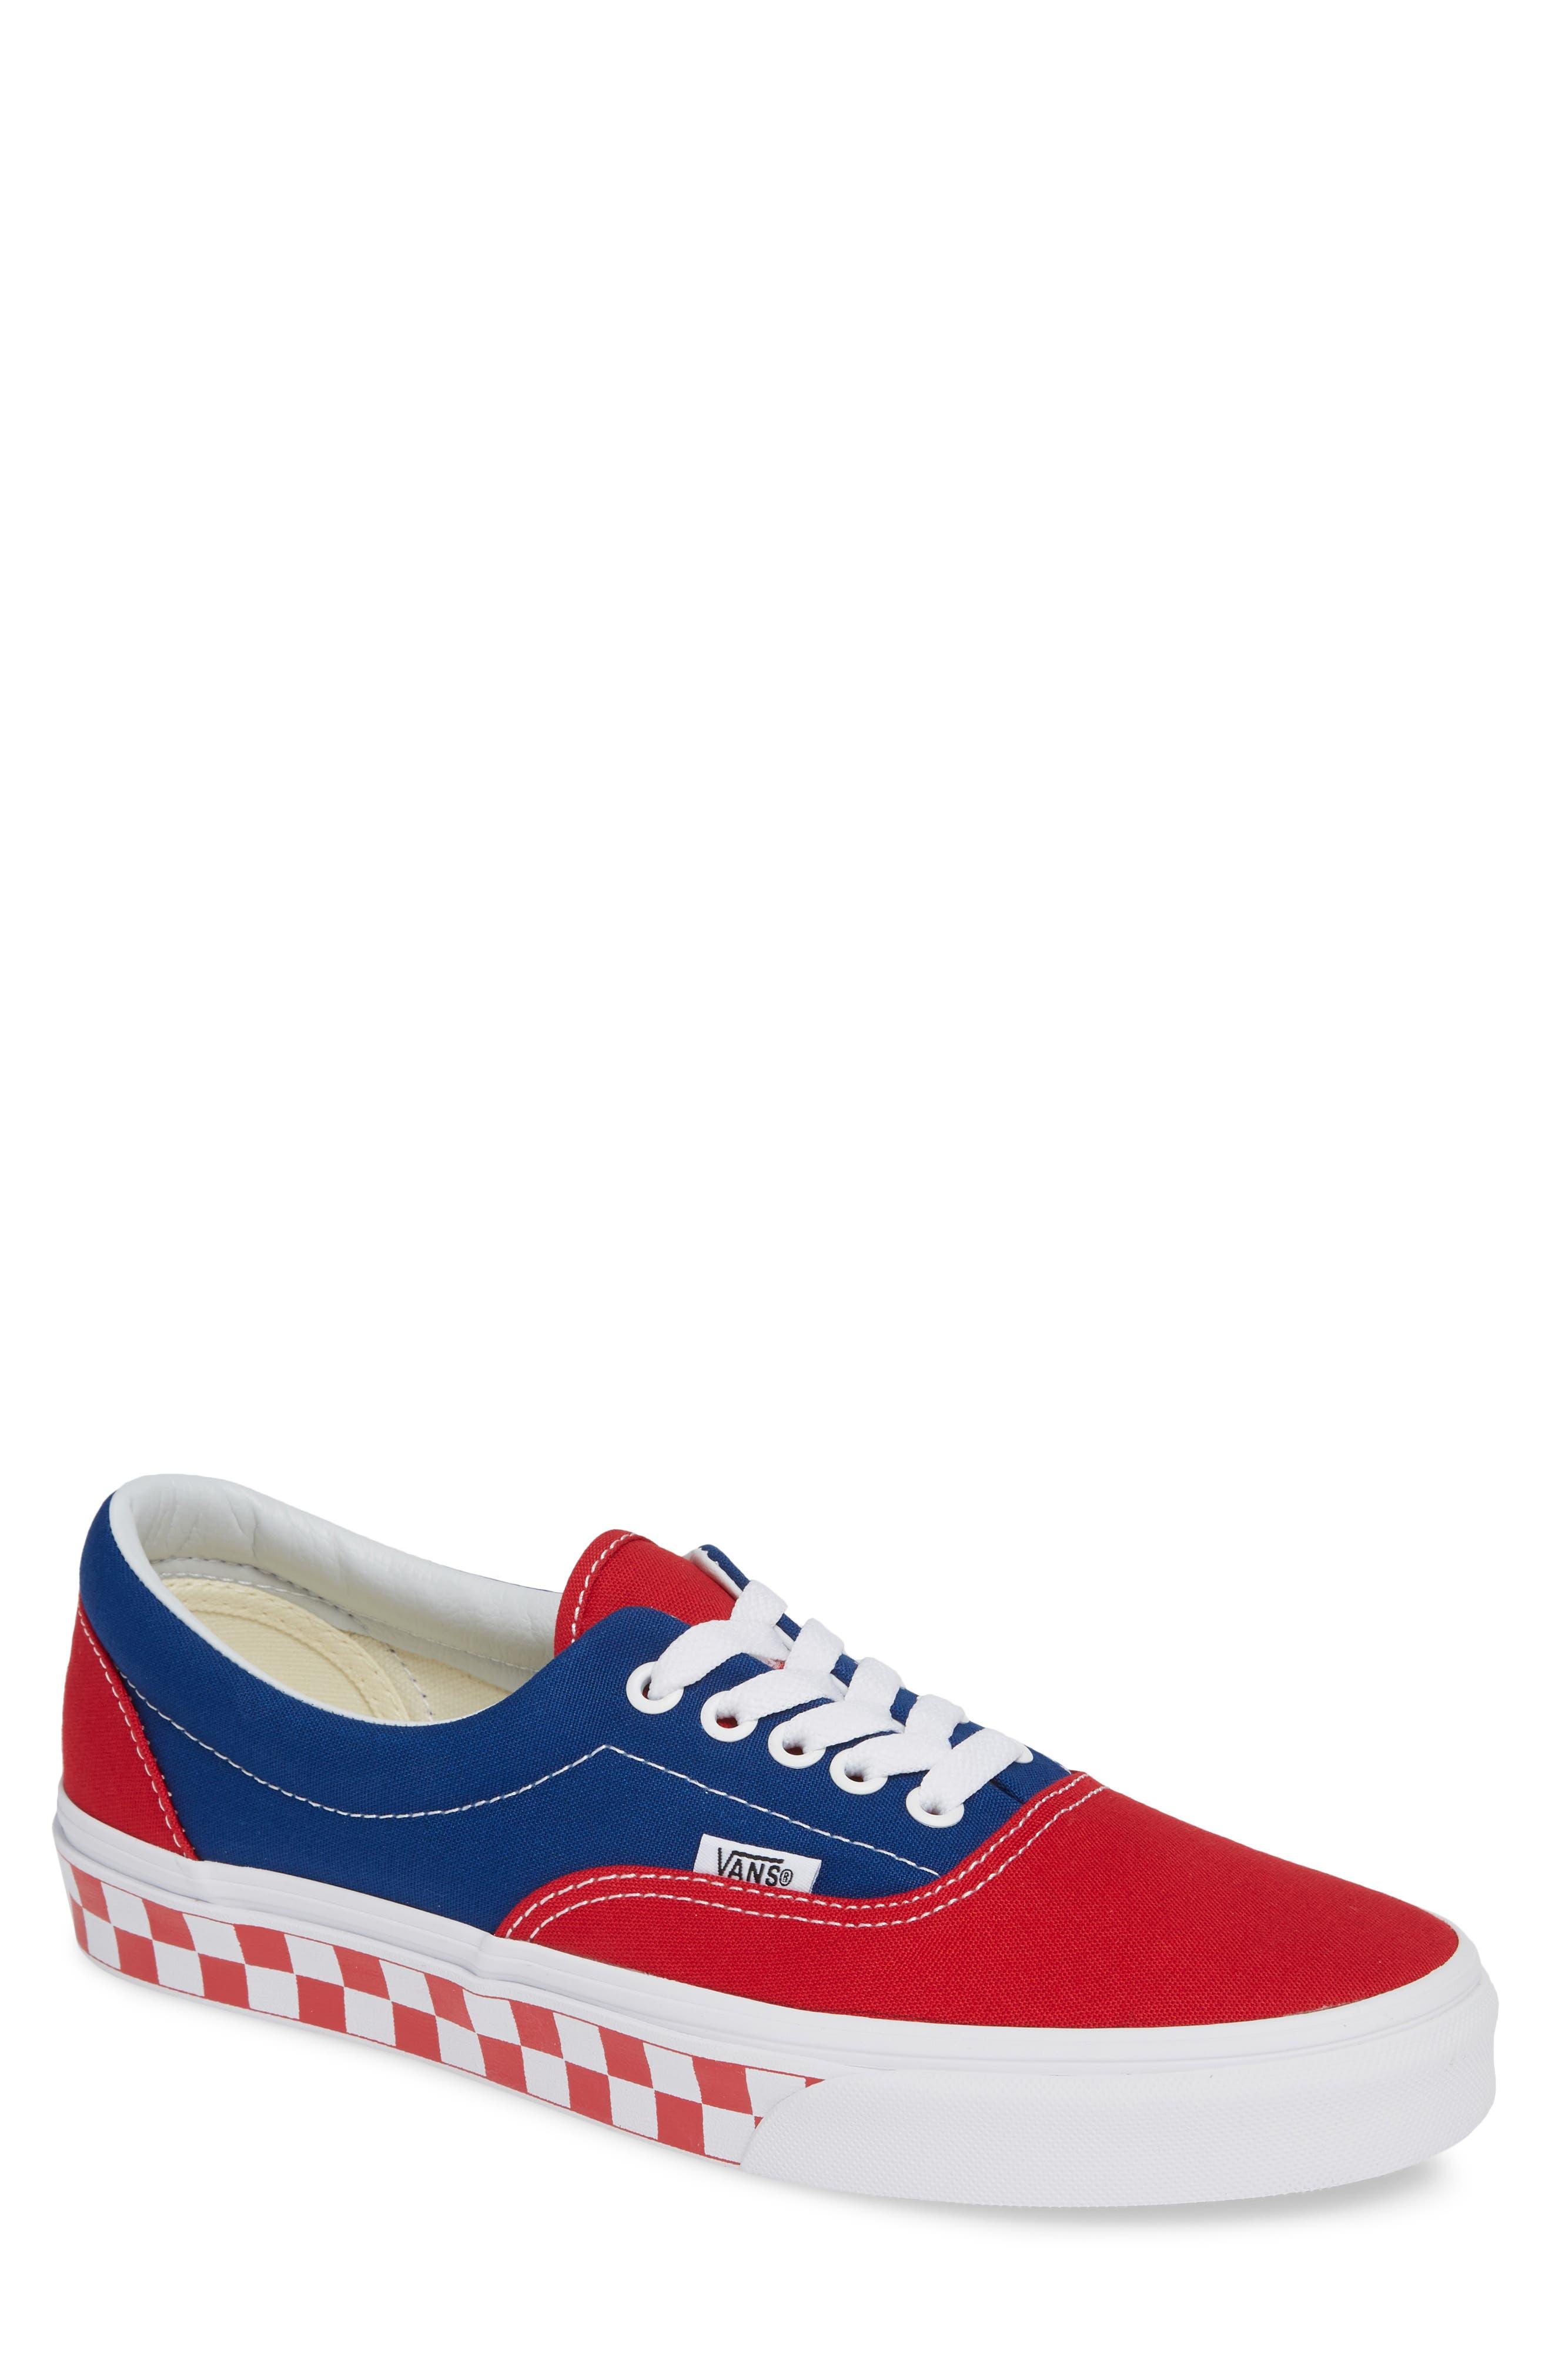 BMX Checkerboard Era Sneaker,                         Main,                         color, BLUE/ RED CHECKER CANVAS